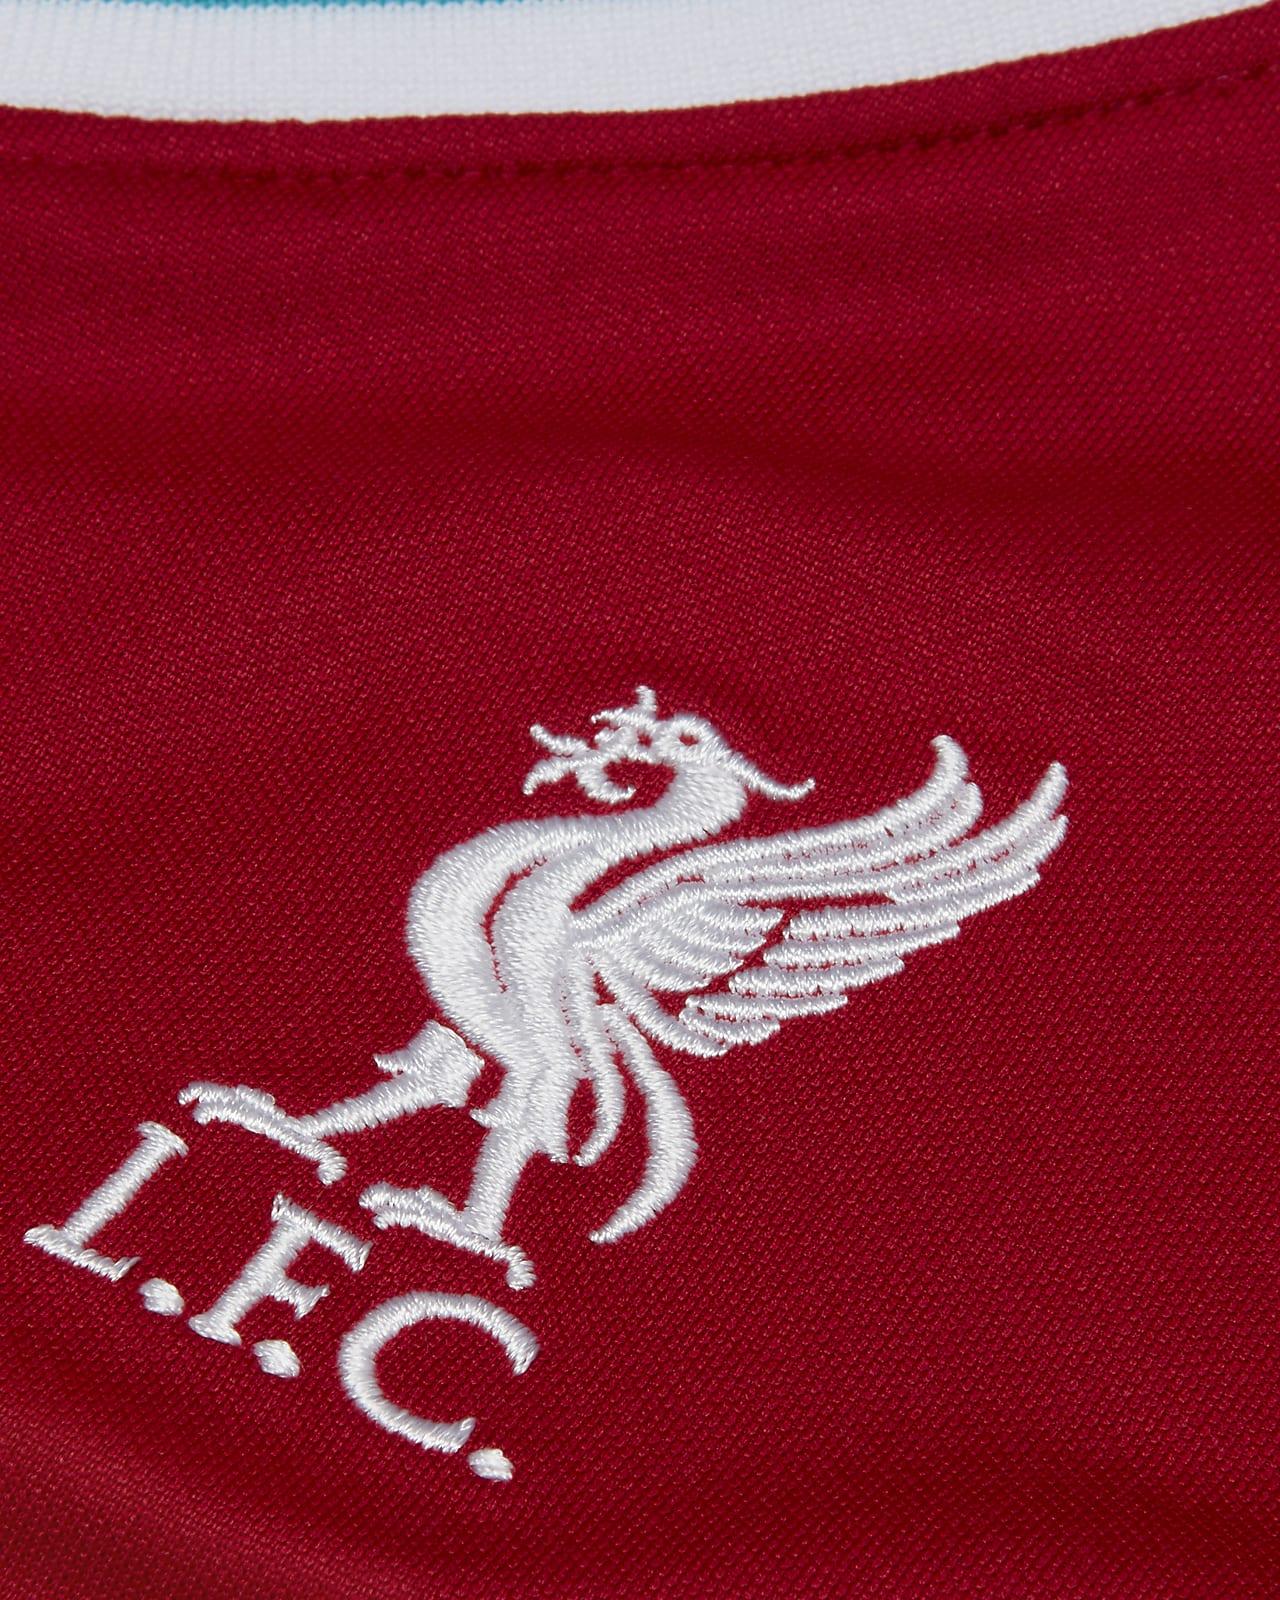 Liverpool FC 2020/21 Home Little Kids' Soccer Kit. Nike.com